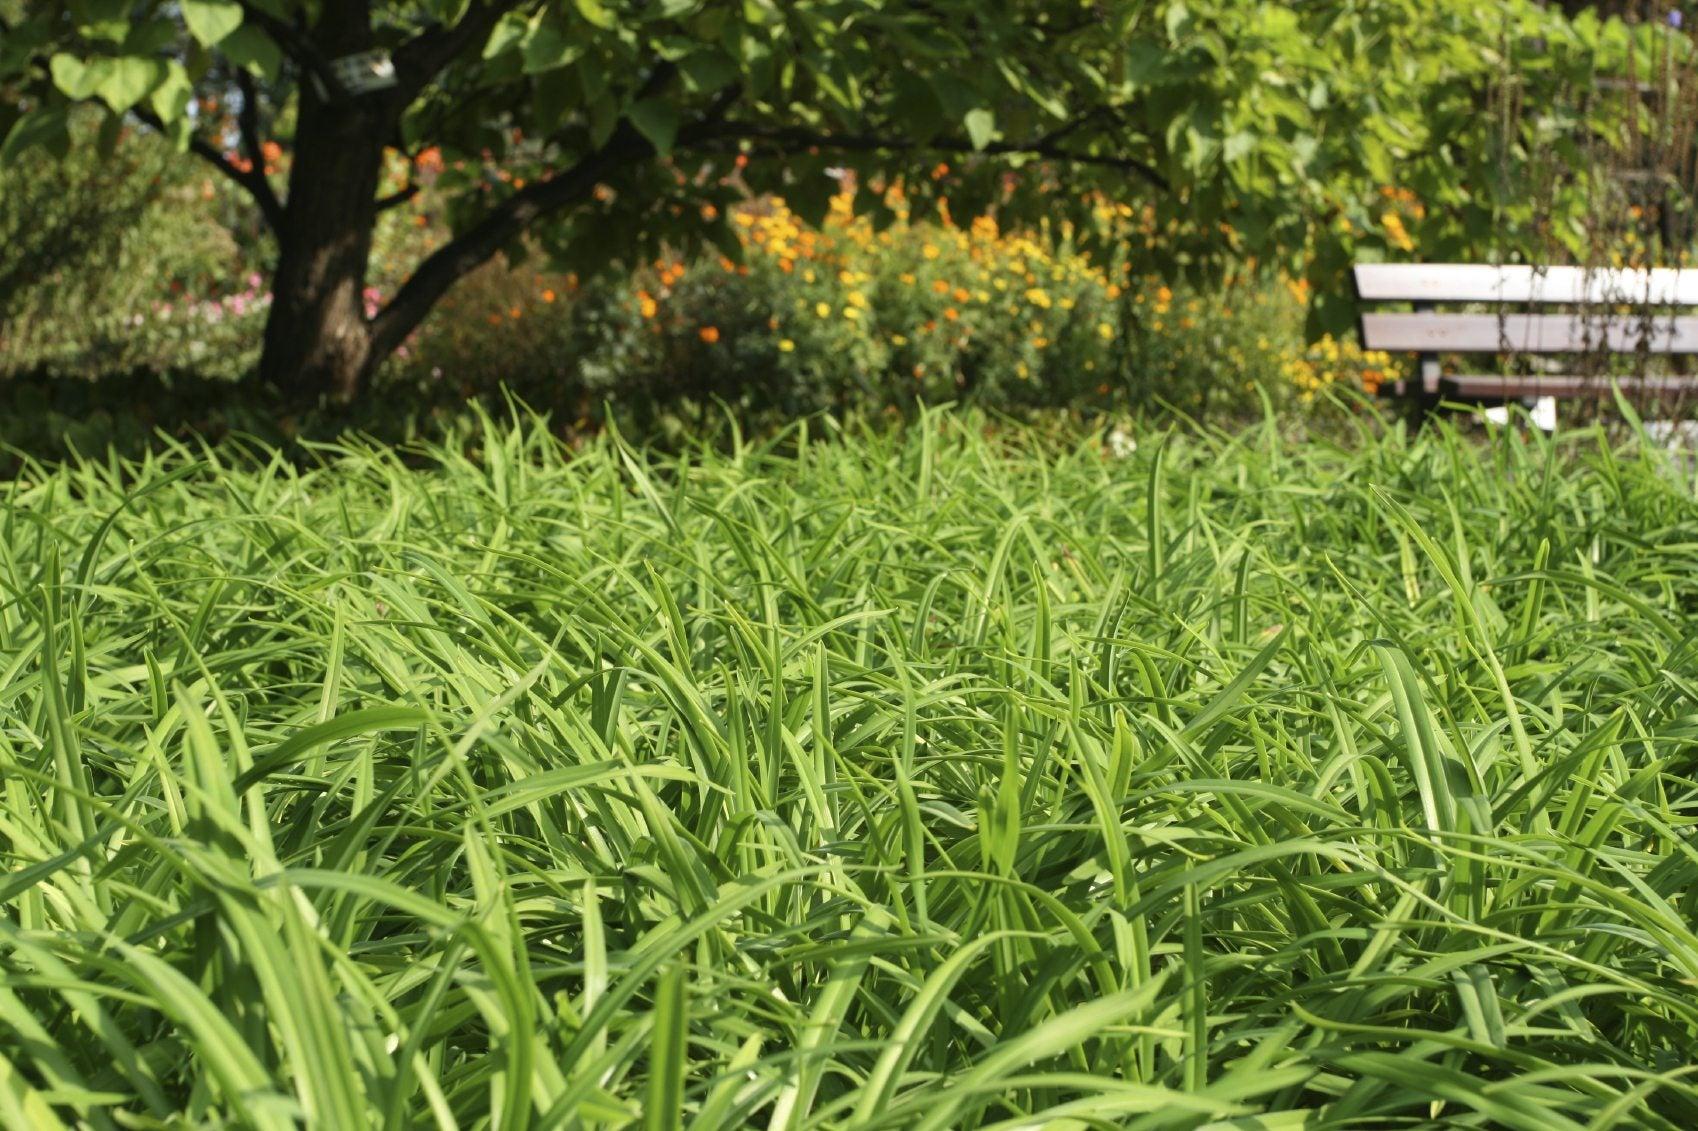 Sedge Lawn Alternative How To Care For A Sedge Grass Lawn